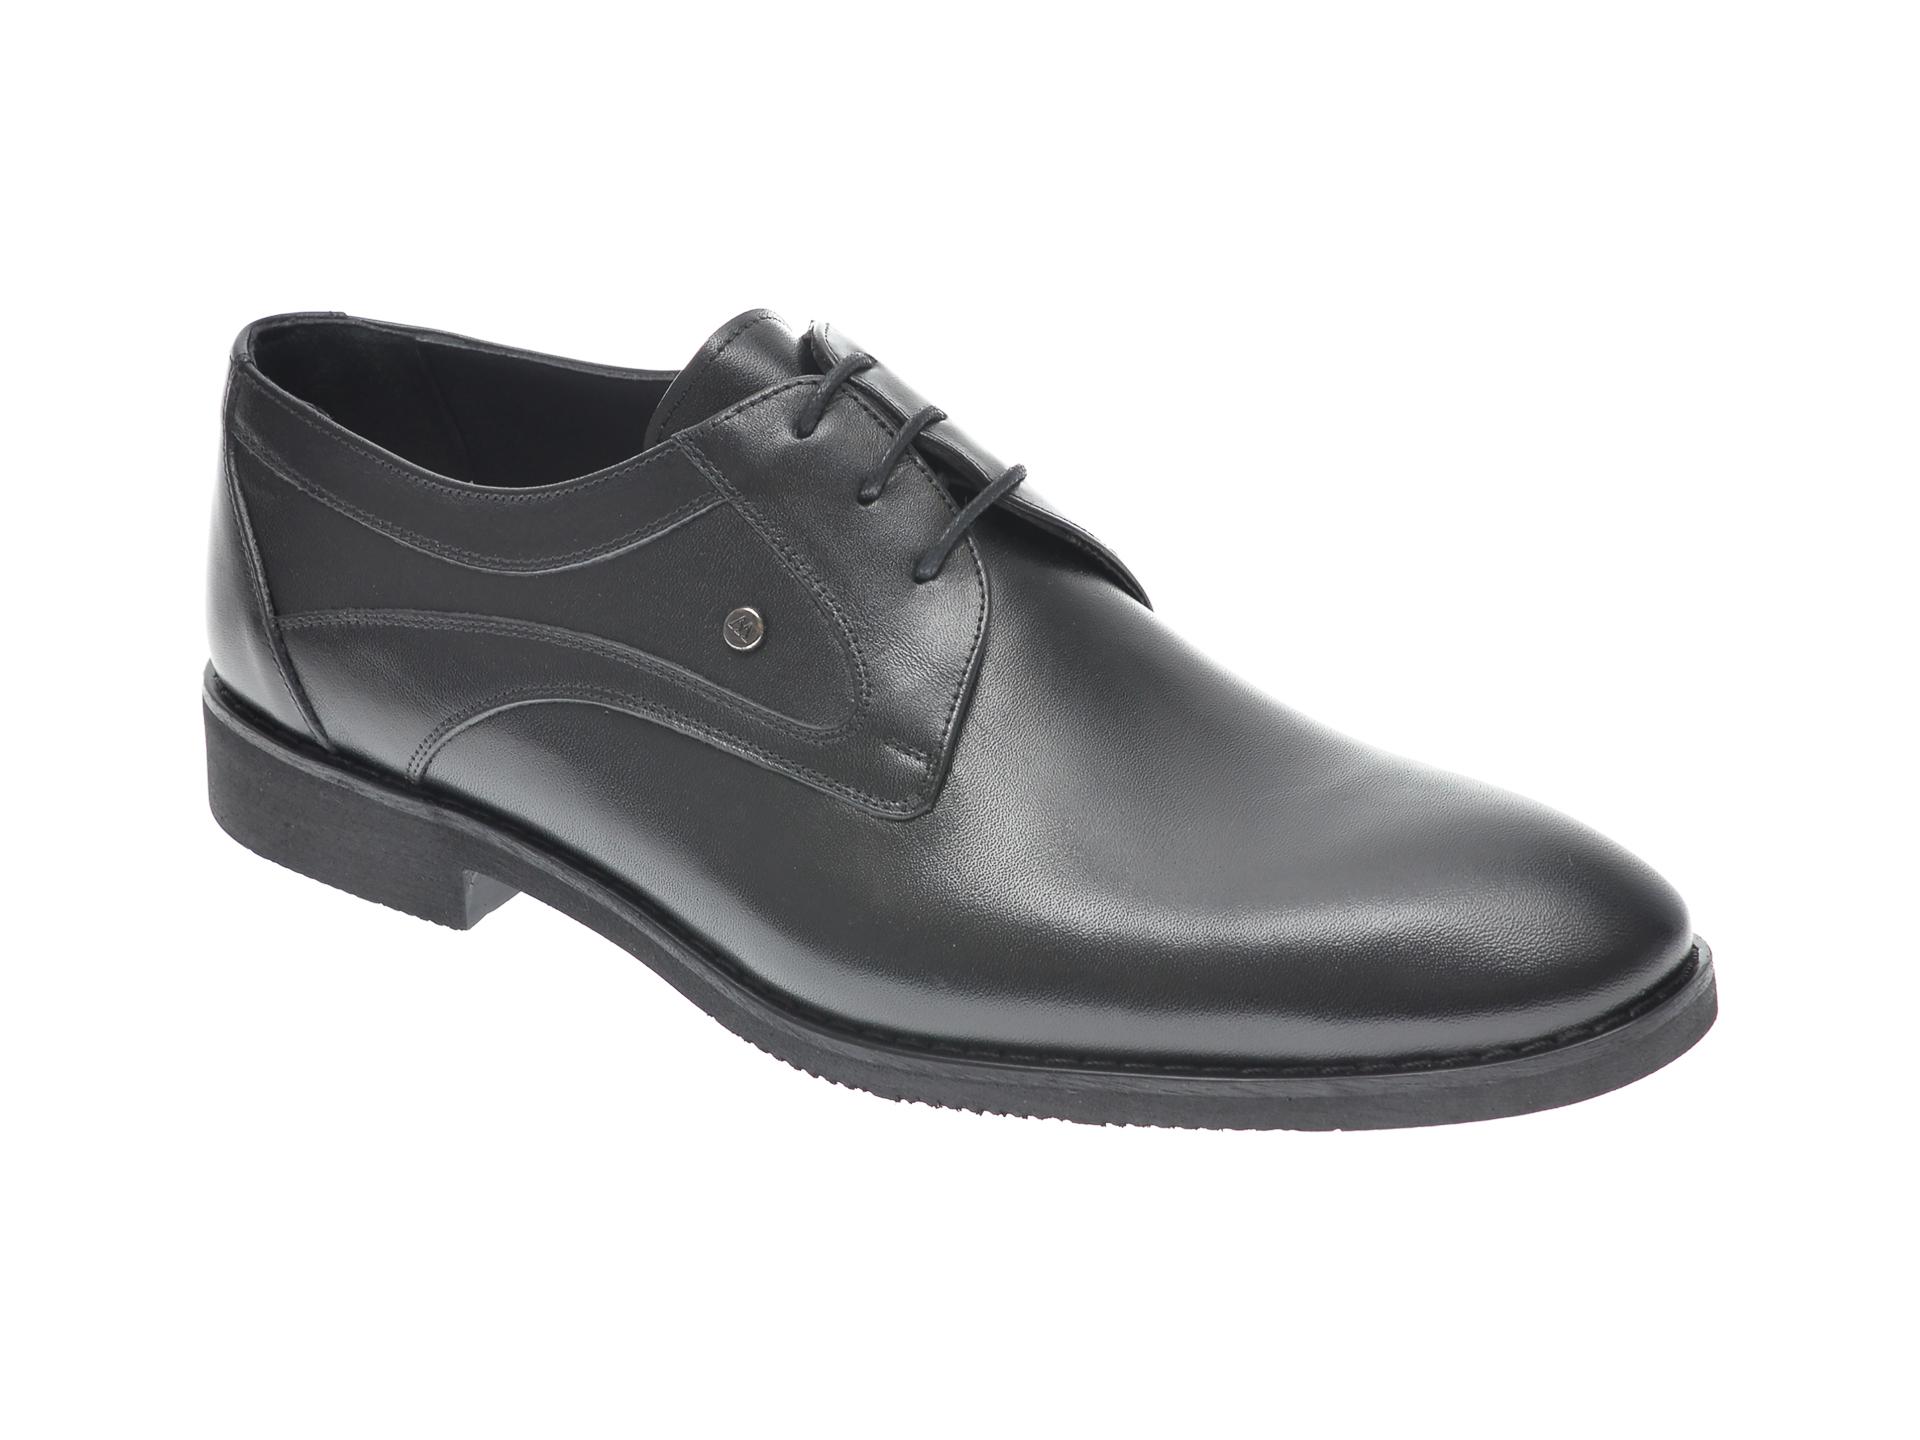 Pantofi OTTER negri, 815, din piele naturala imagine